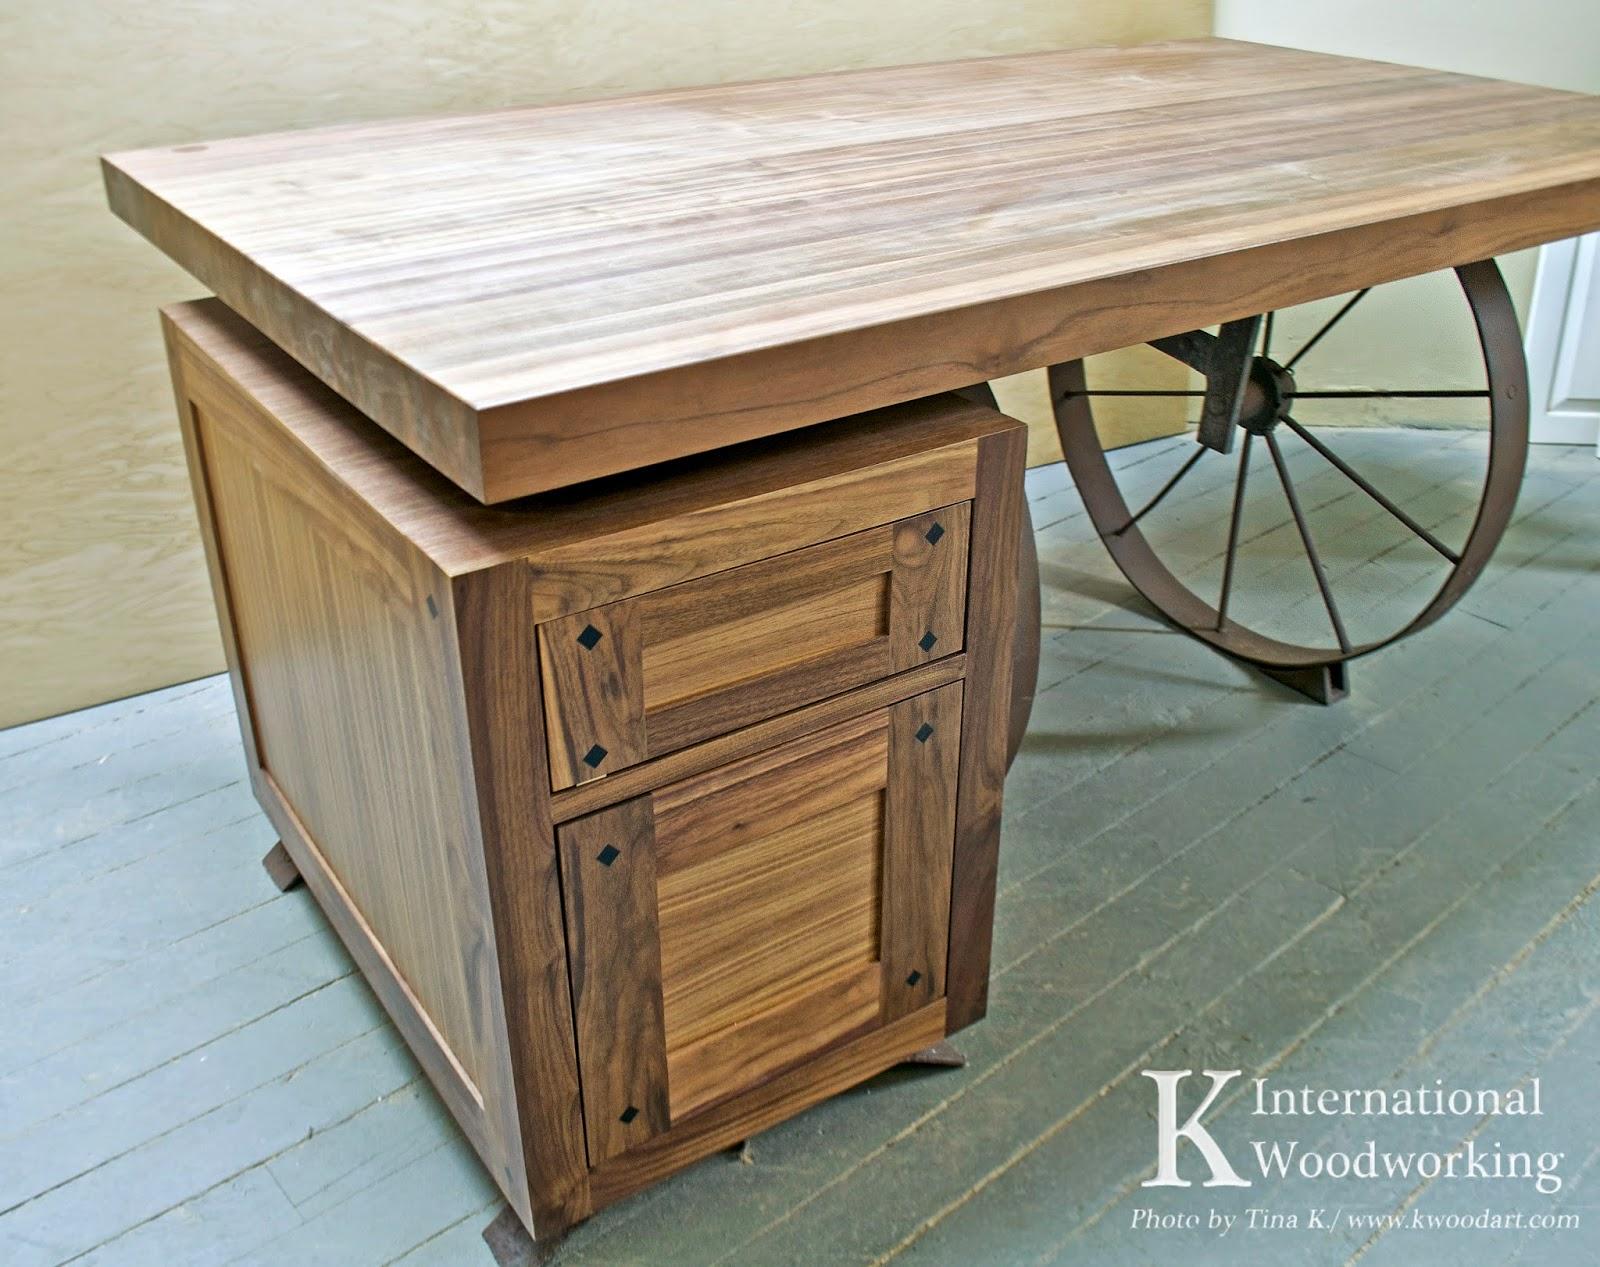 Iron Wheel Office Table K International Woodworking - Wheelbarrow coffee table